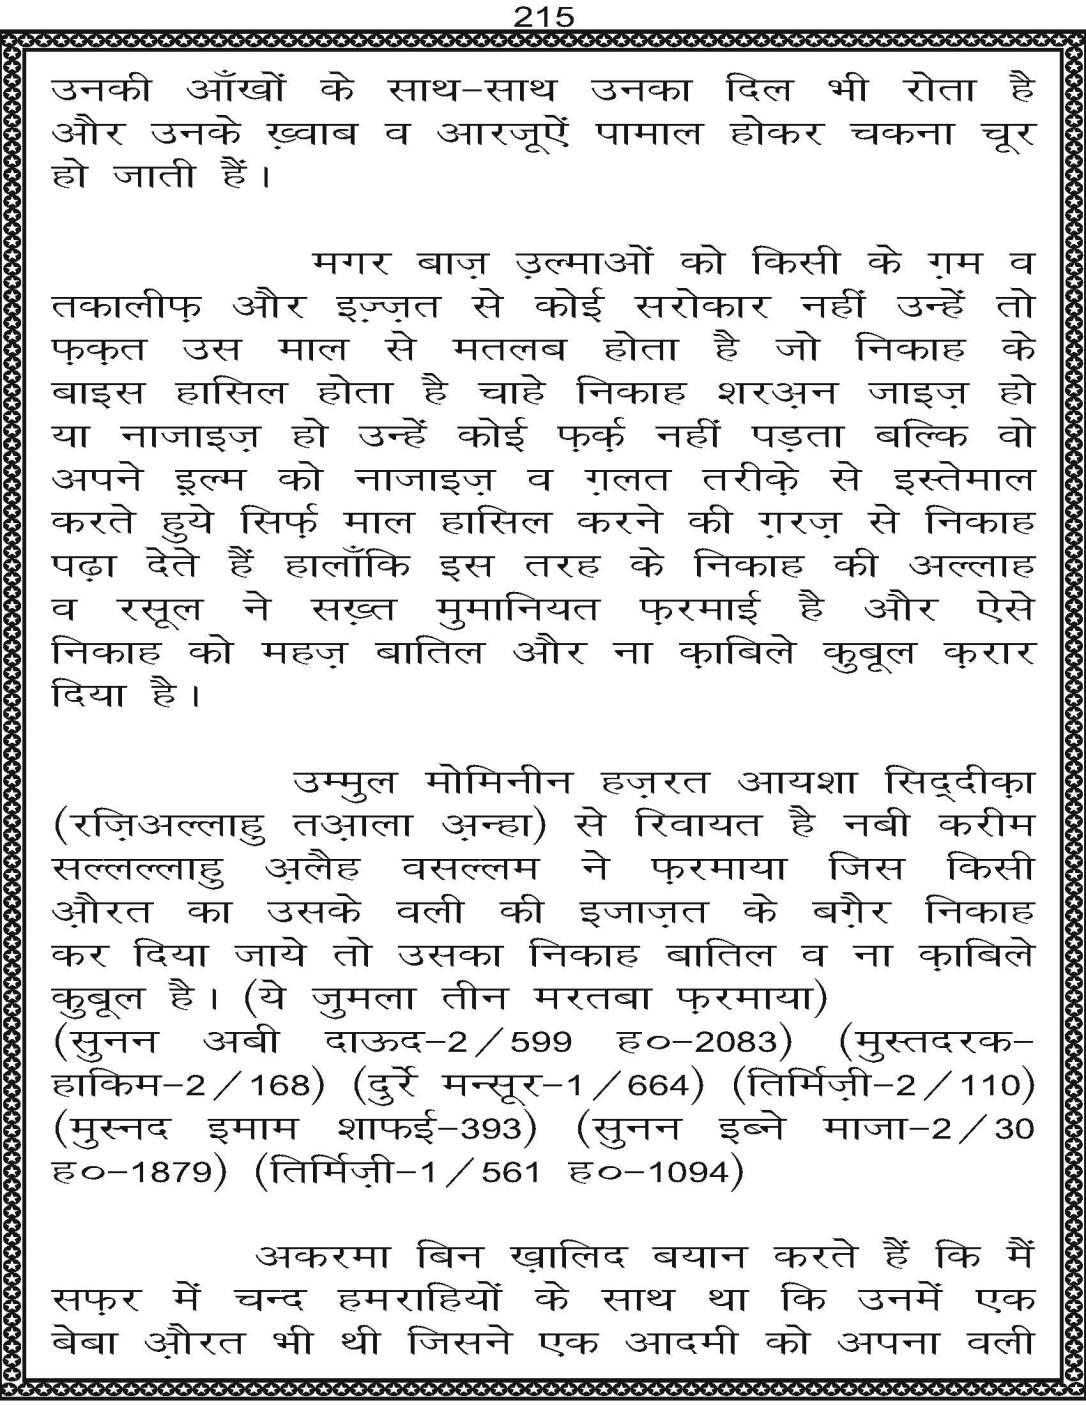 AzmateTaziyadari_Page_215